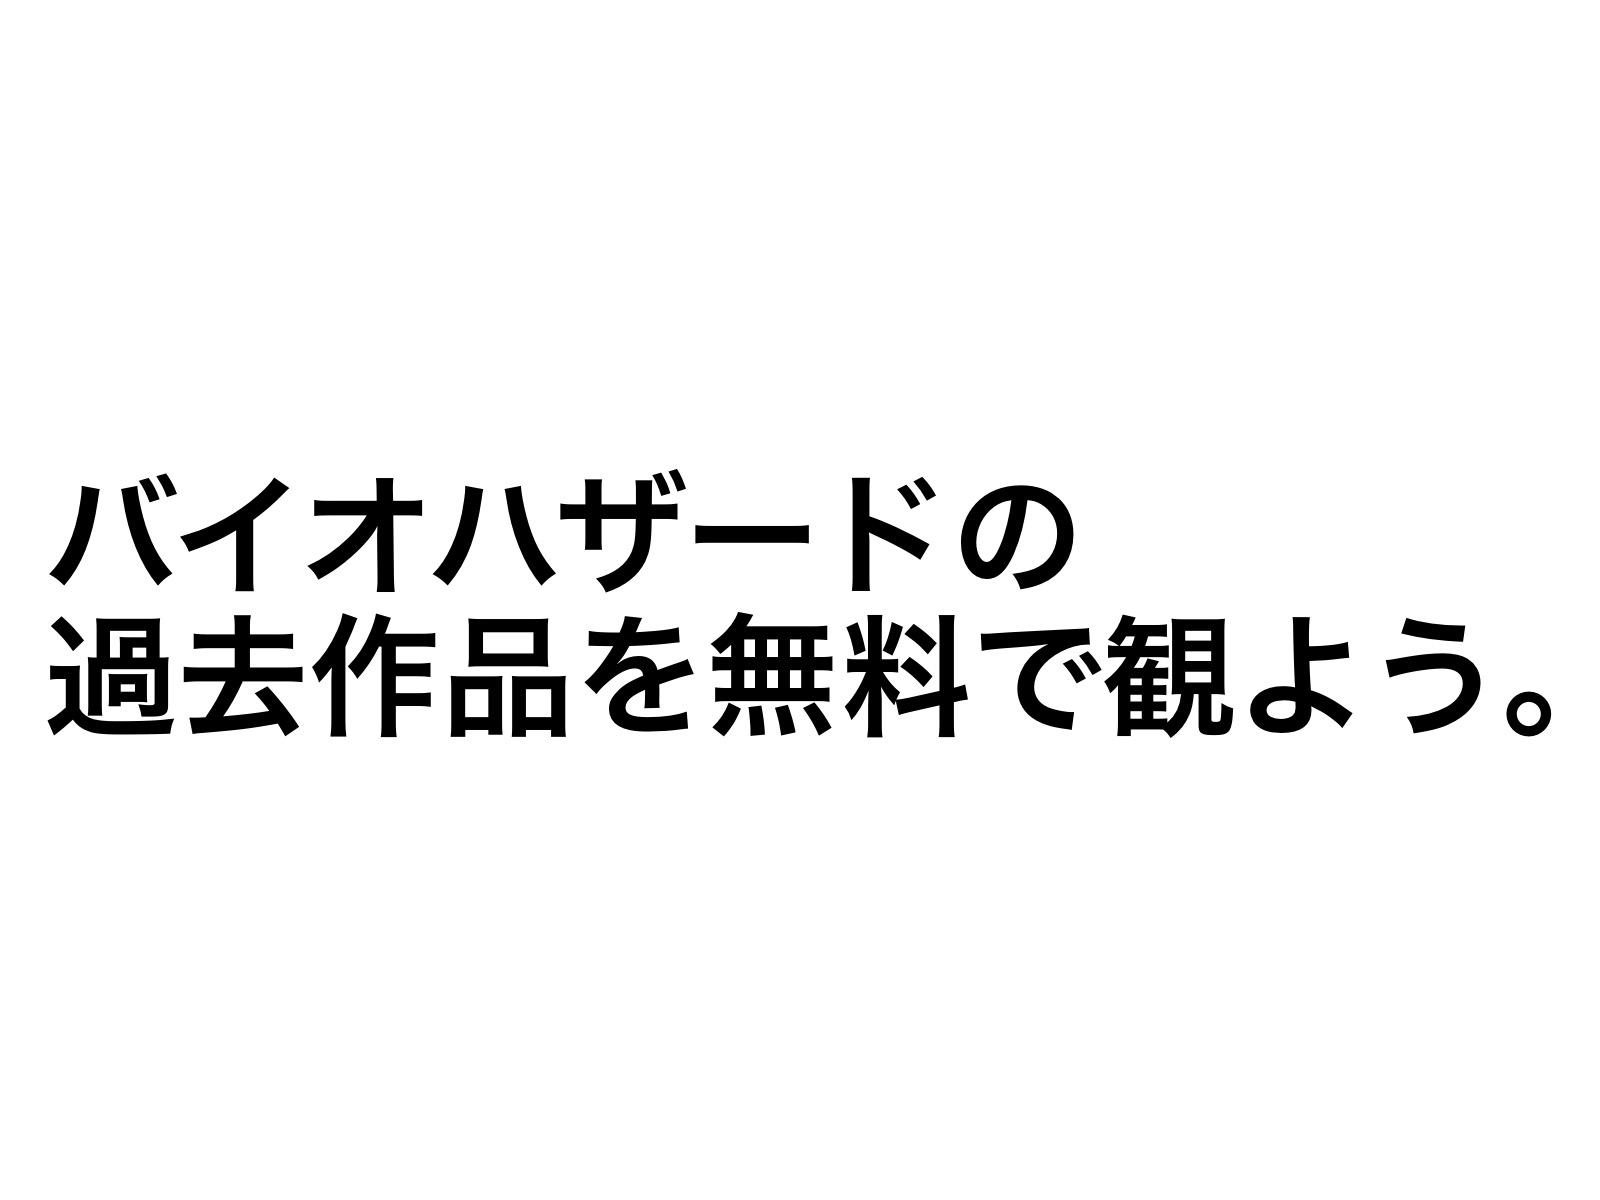 2016 12 23 20 00 45